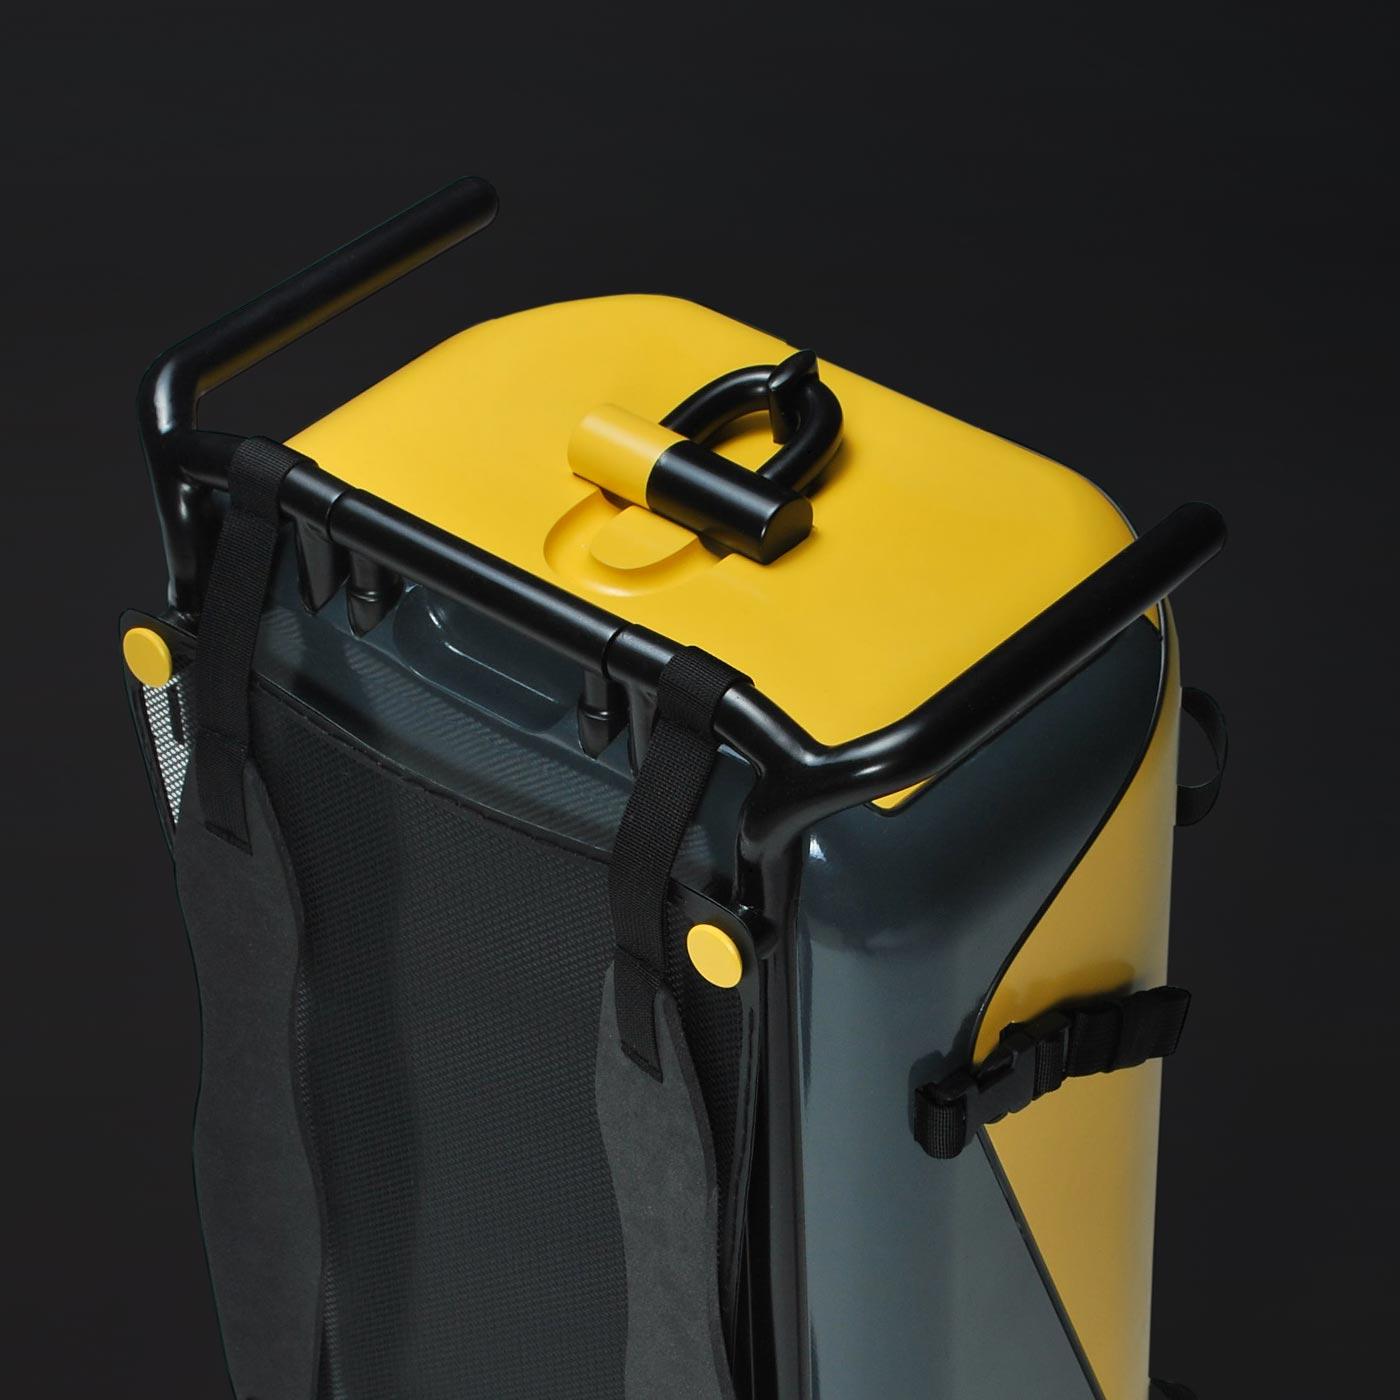 Stadtkoffer mockup by WACH designstudio back-top-view